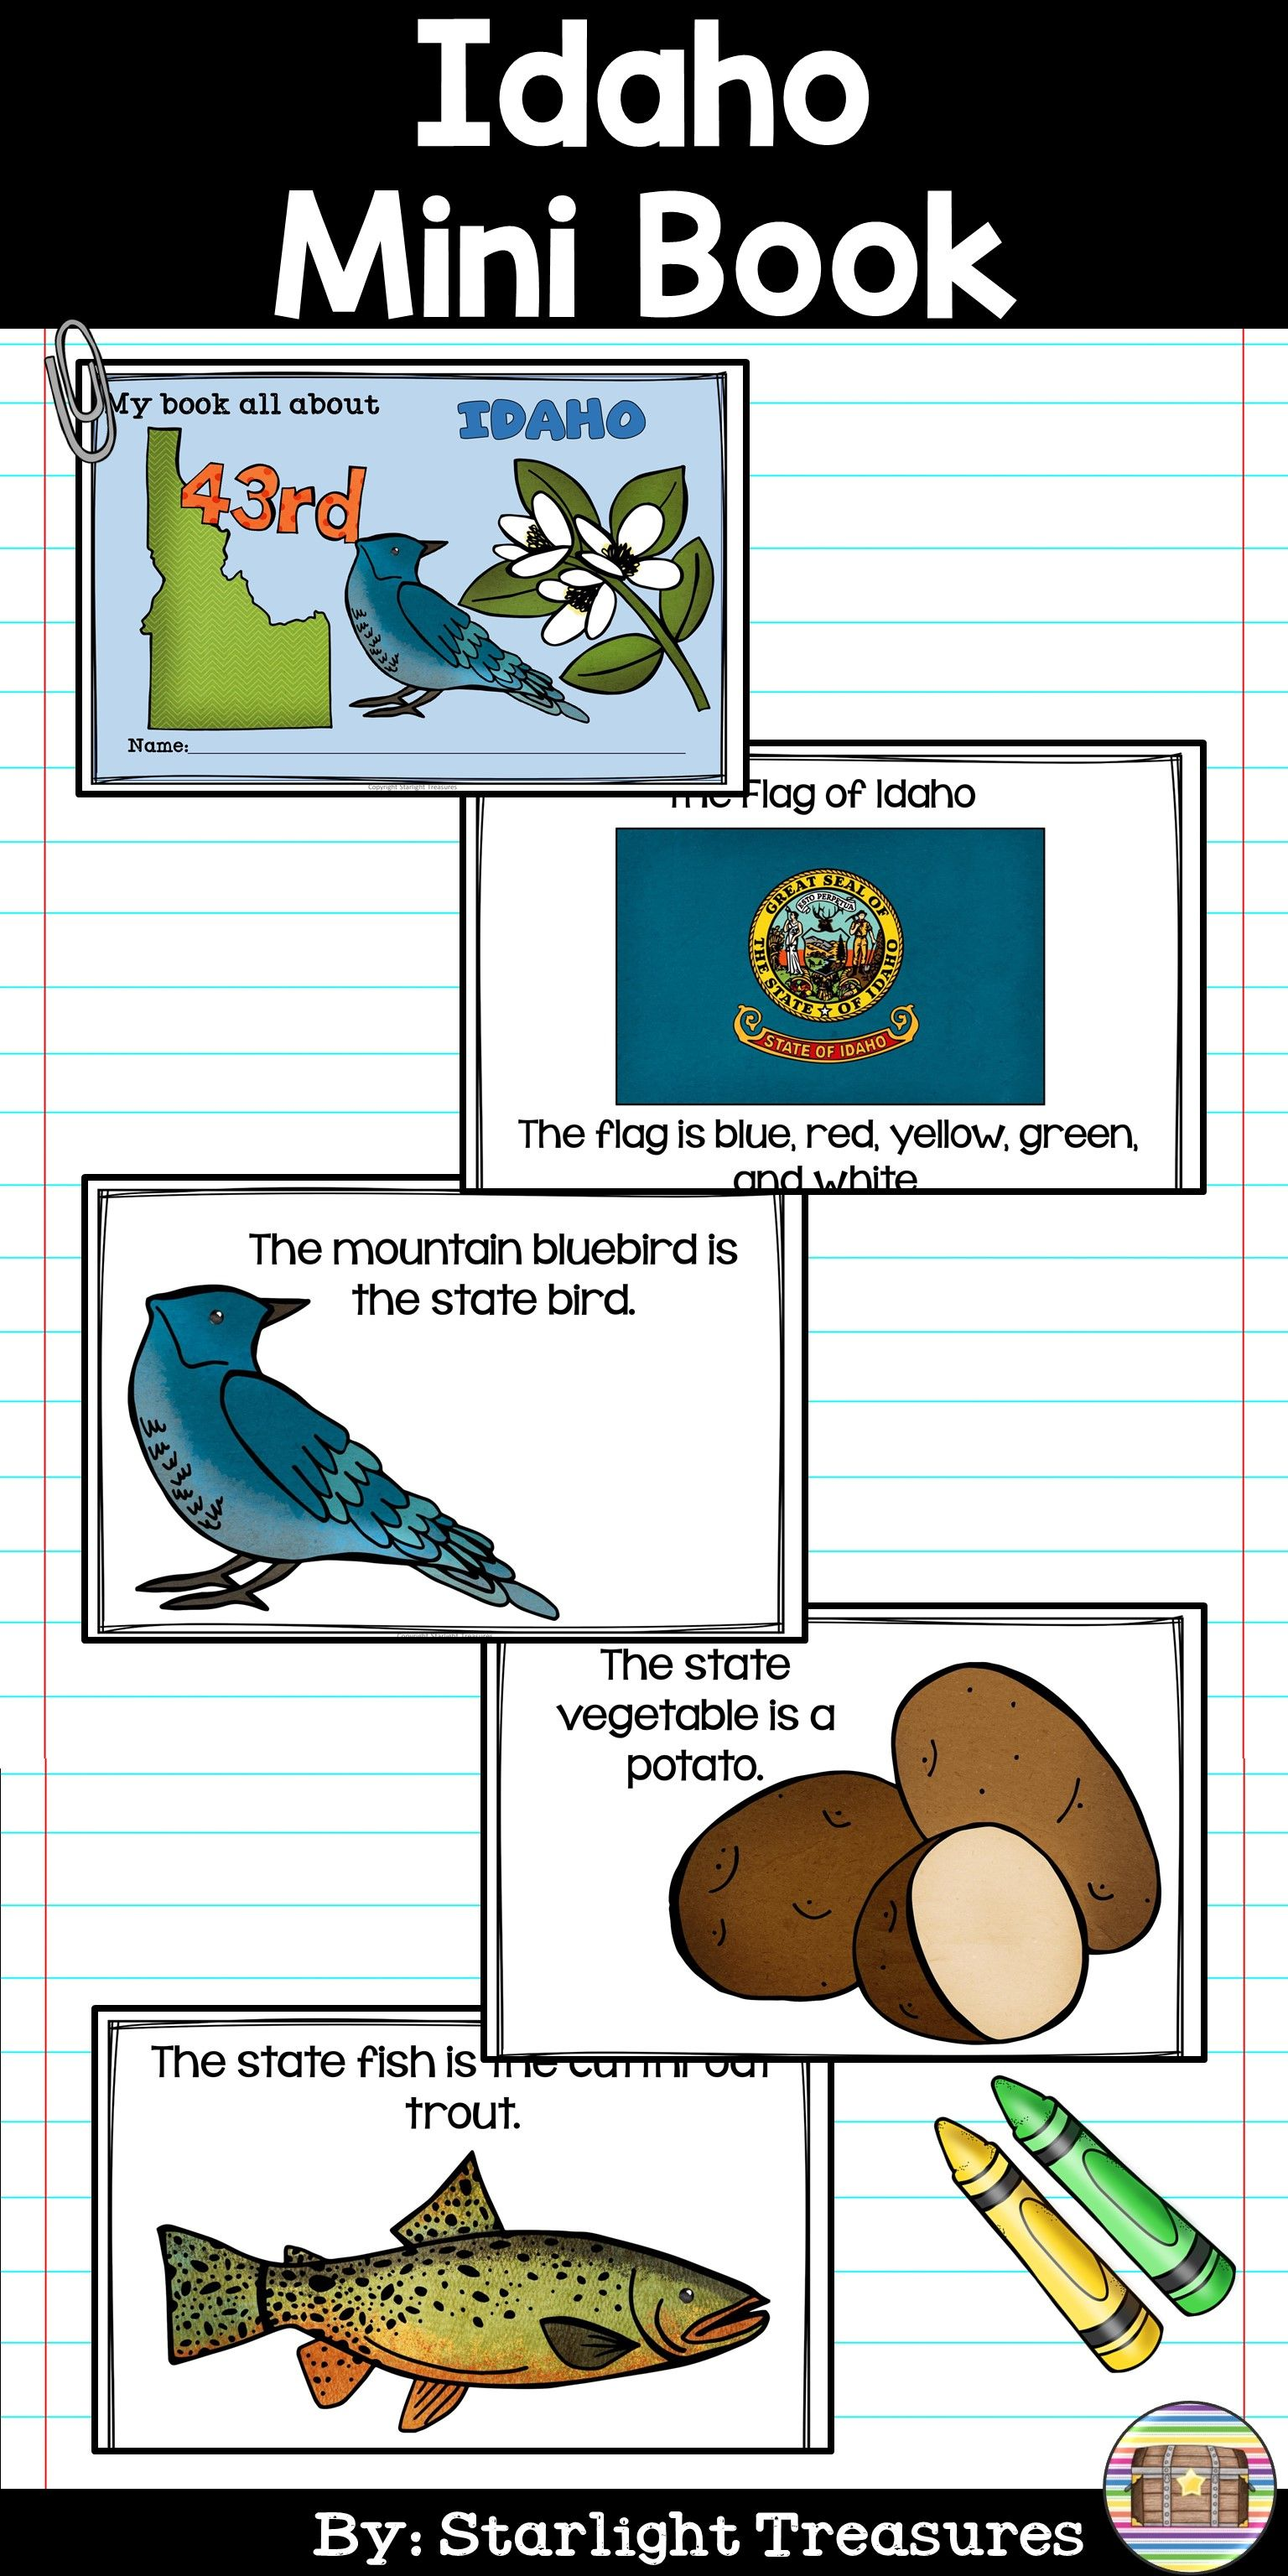 Idaho Mini Book For Early Readers